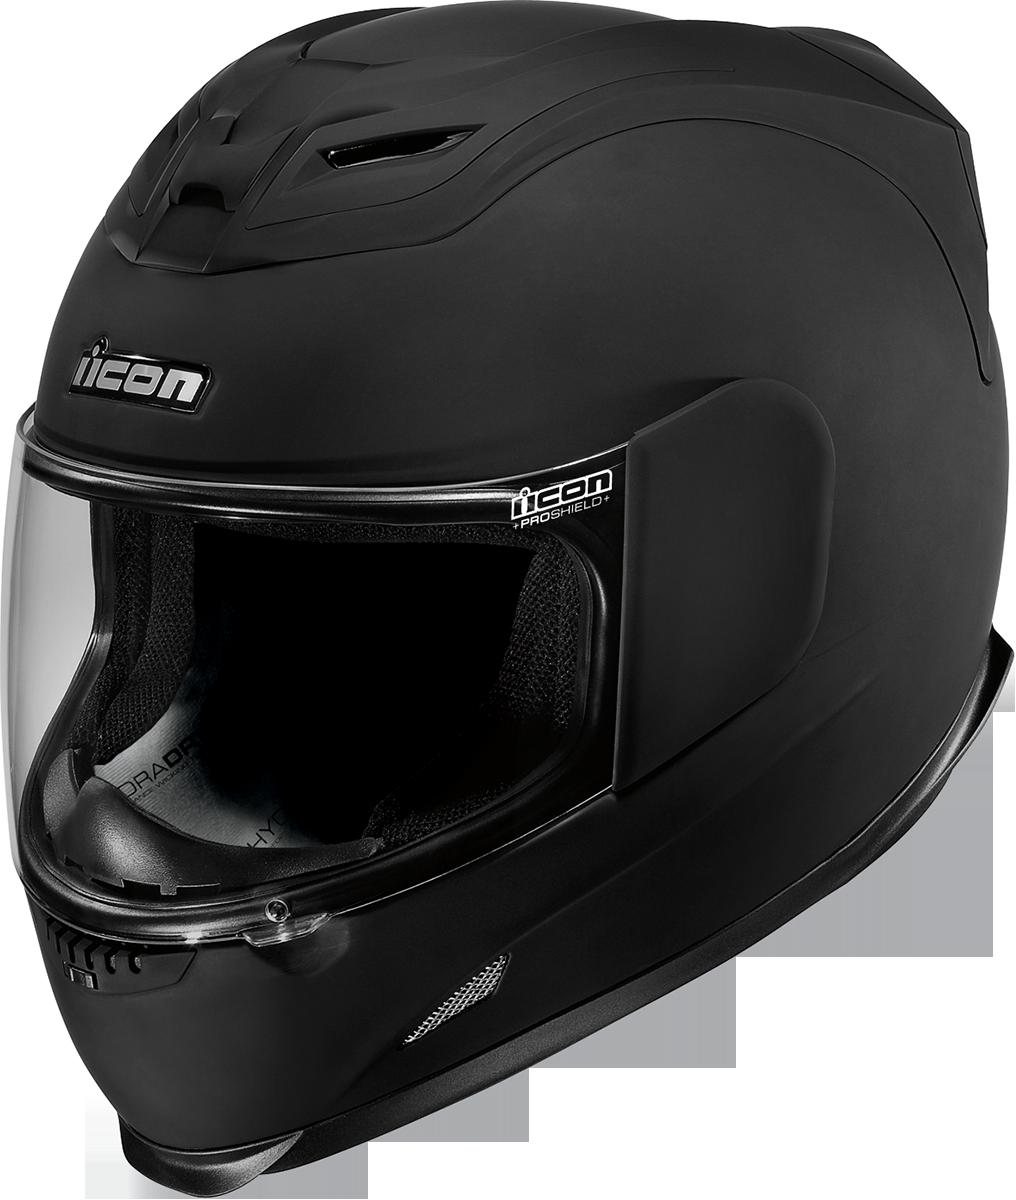 ICON Airframe Rubatone Black Helmet, Cool motorcycle